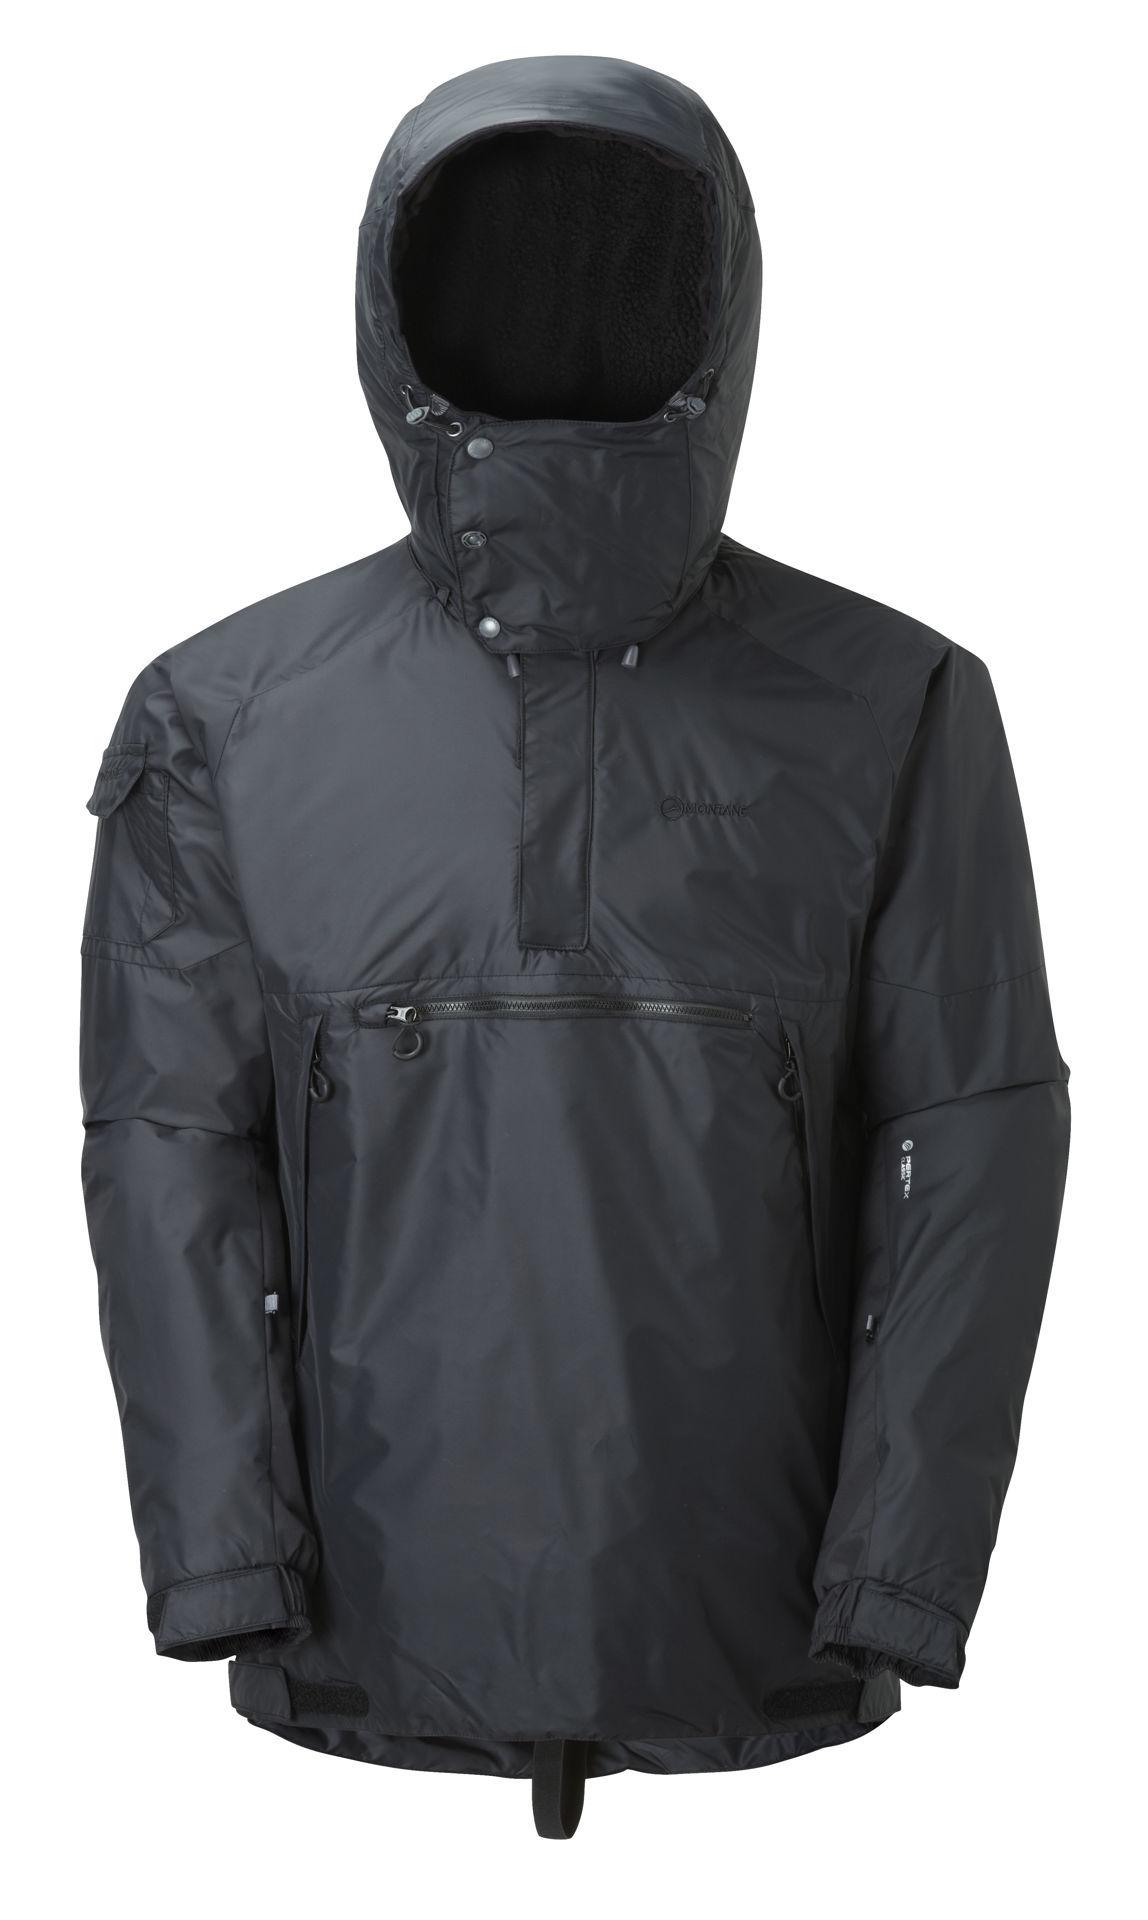 Montane Extreme Smock, Black, XL